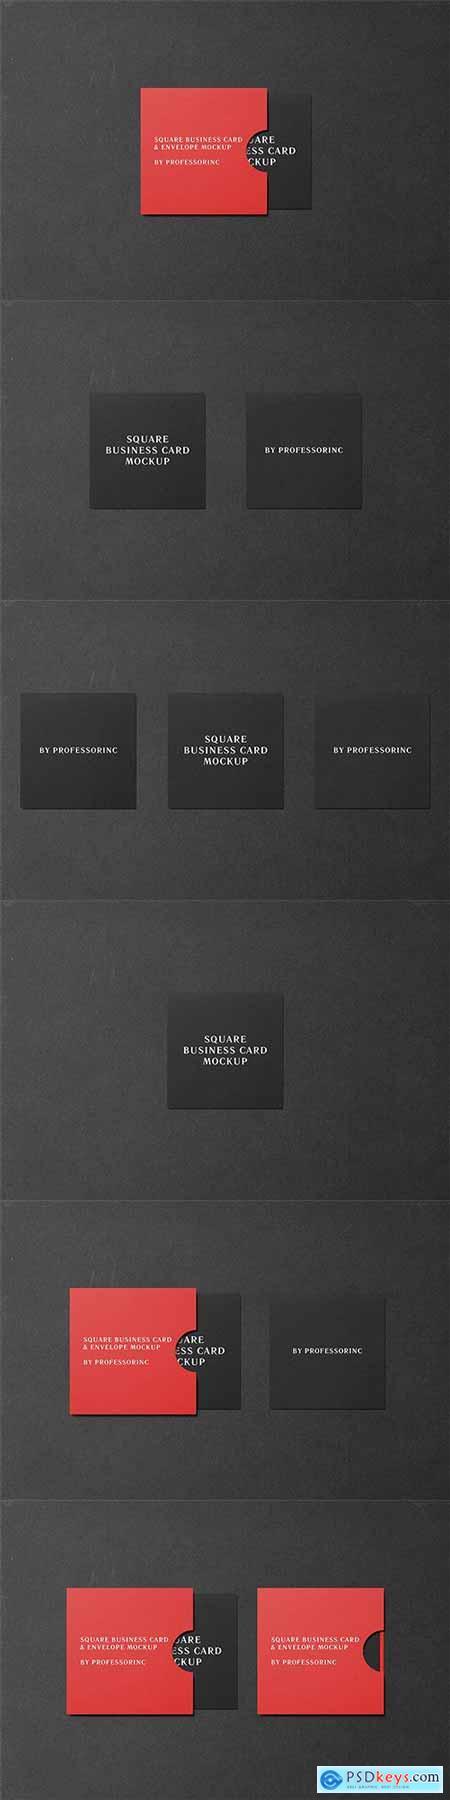 Square Business Card Mockup - Black Edition